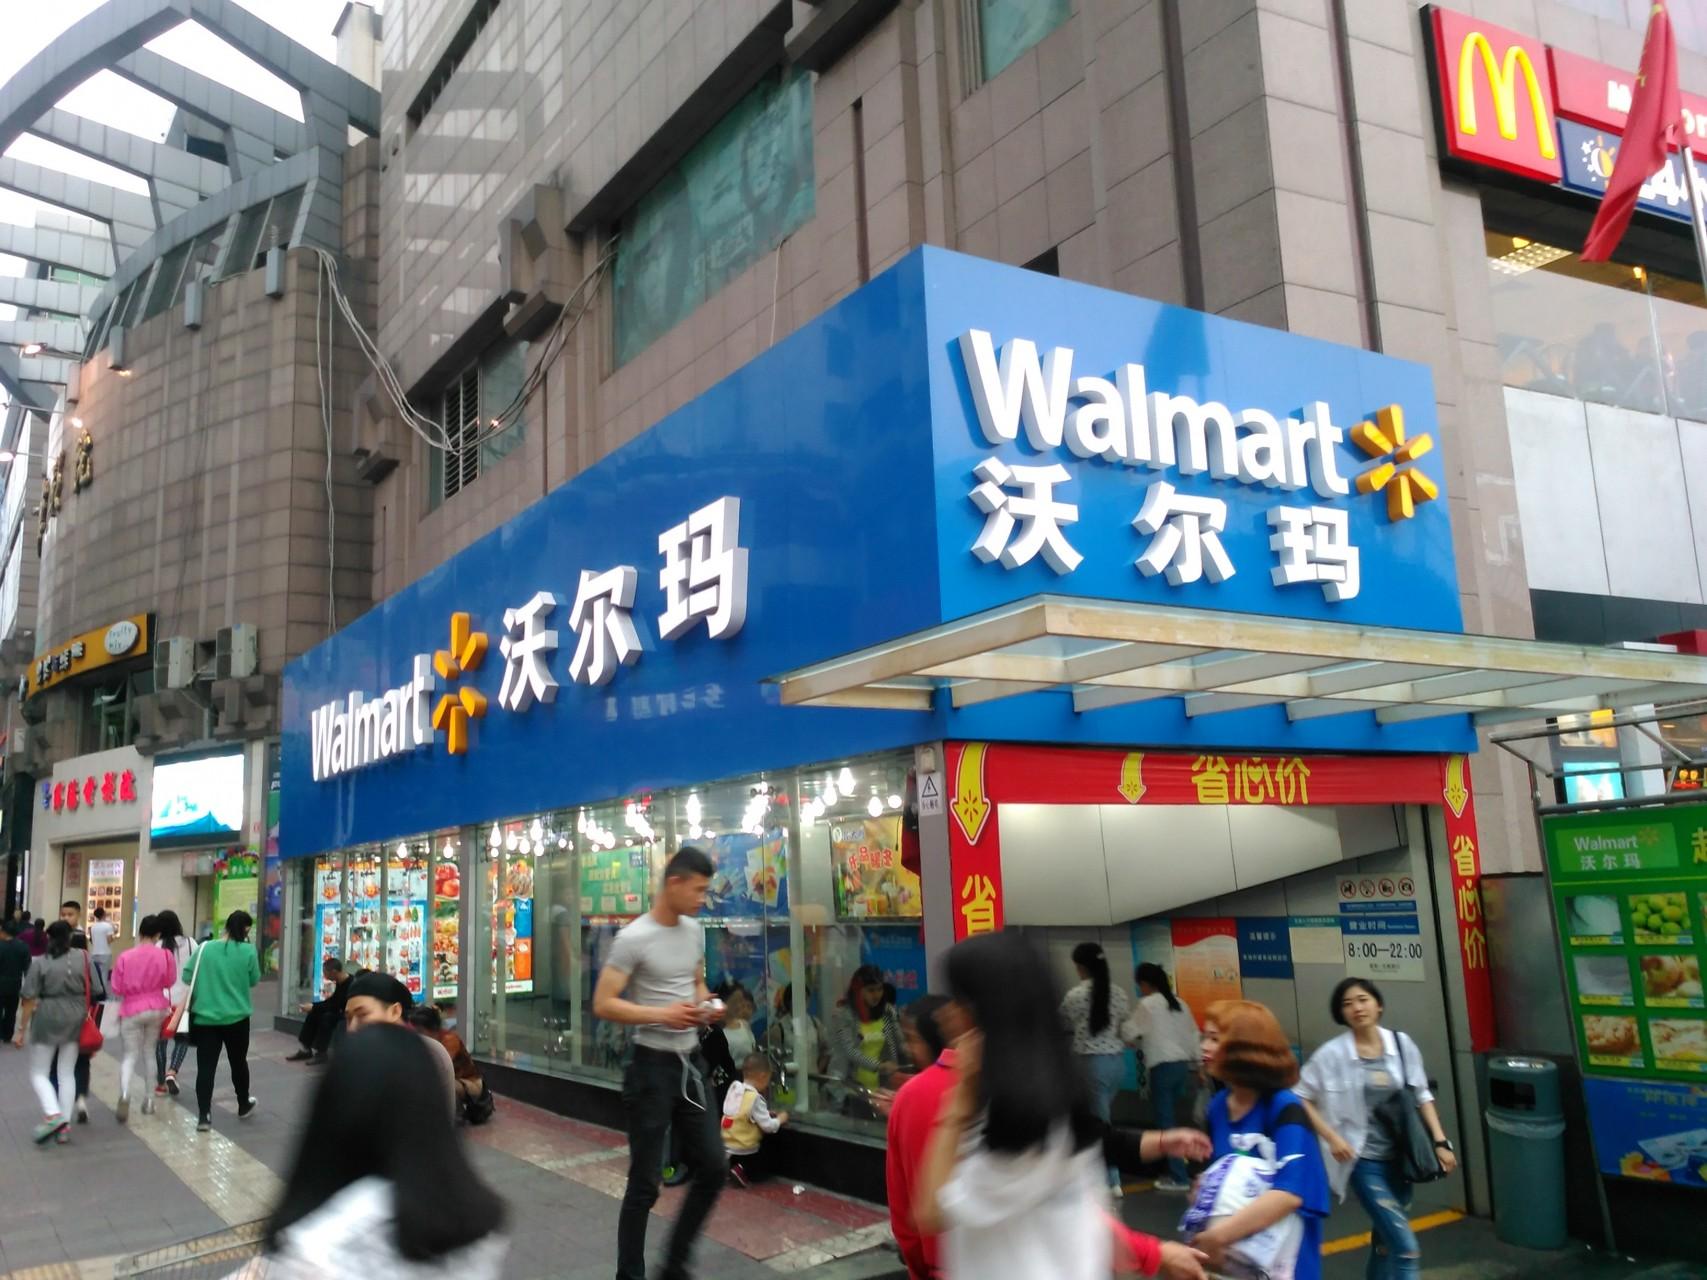 Briefing: Walmart China launches blockchain food safety platform